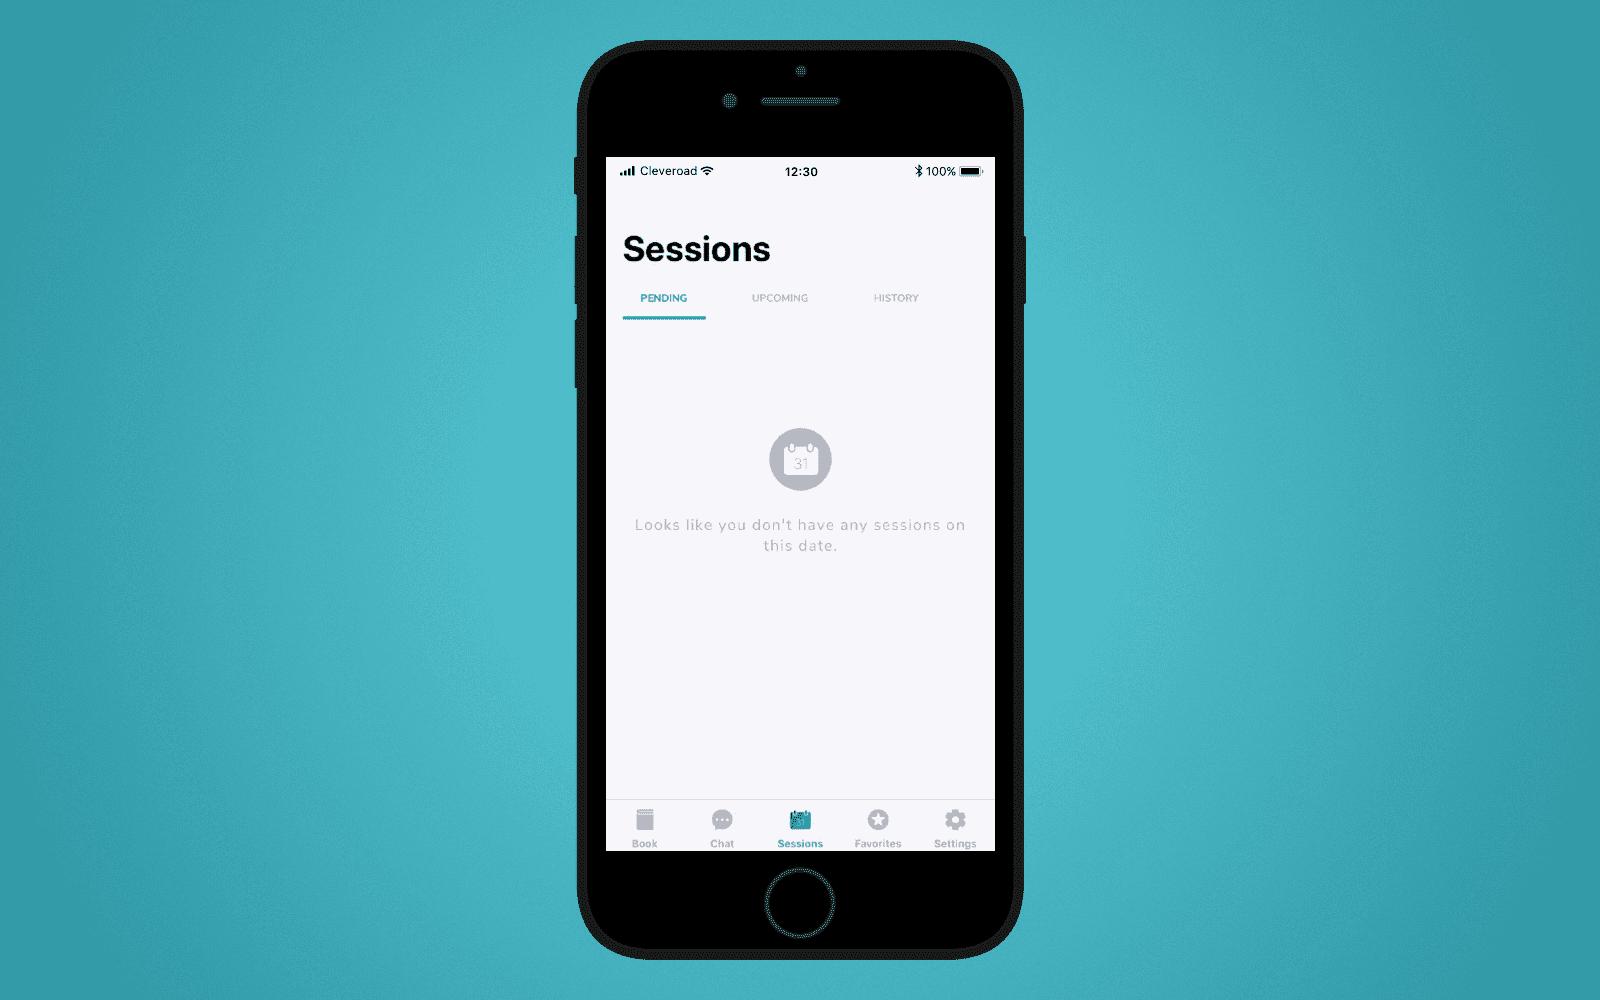 Sessions screen in LetsSurf mobile application